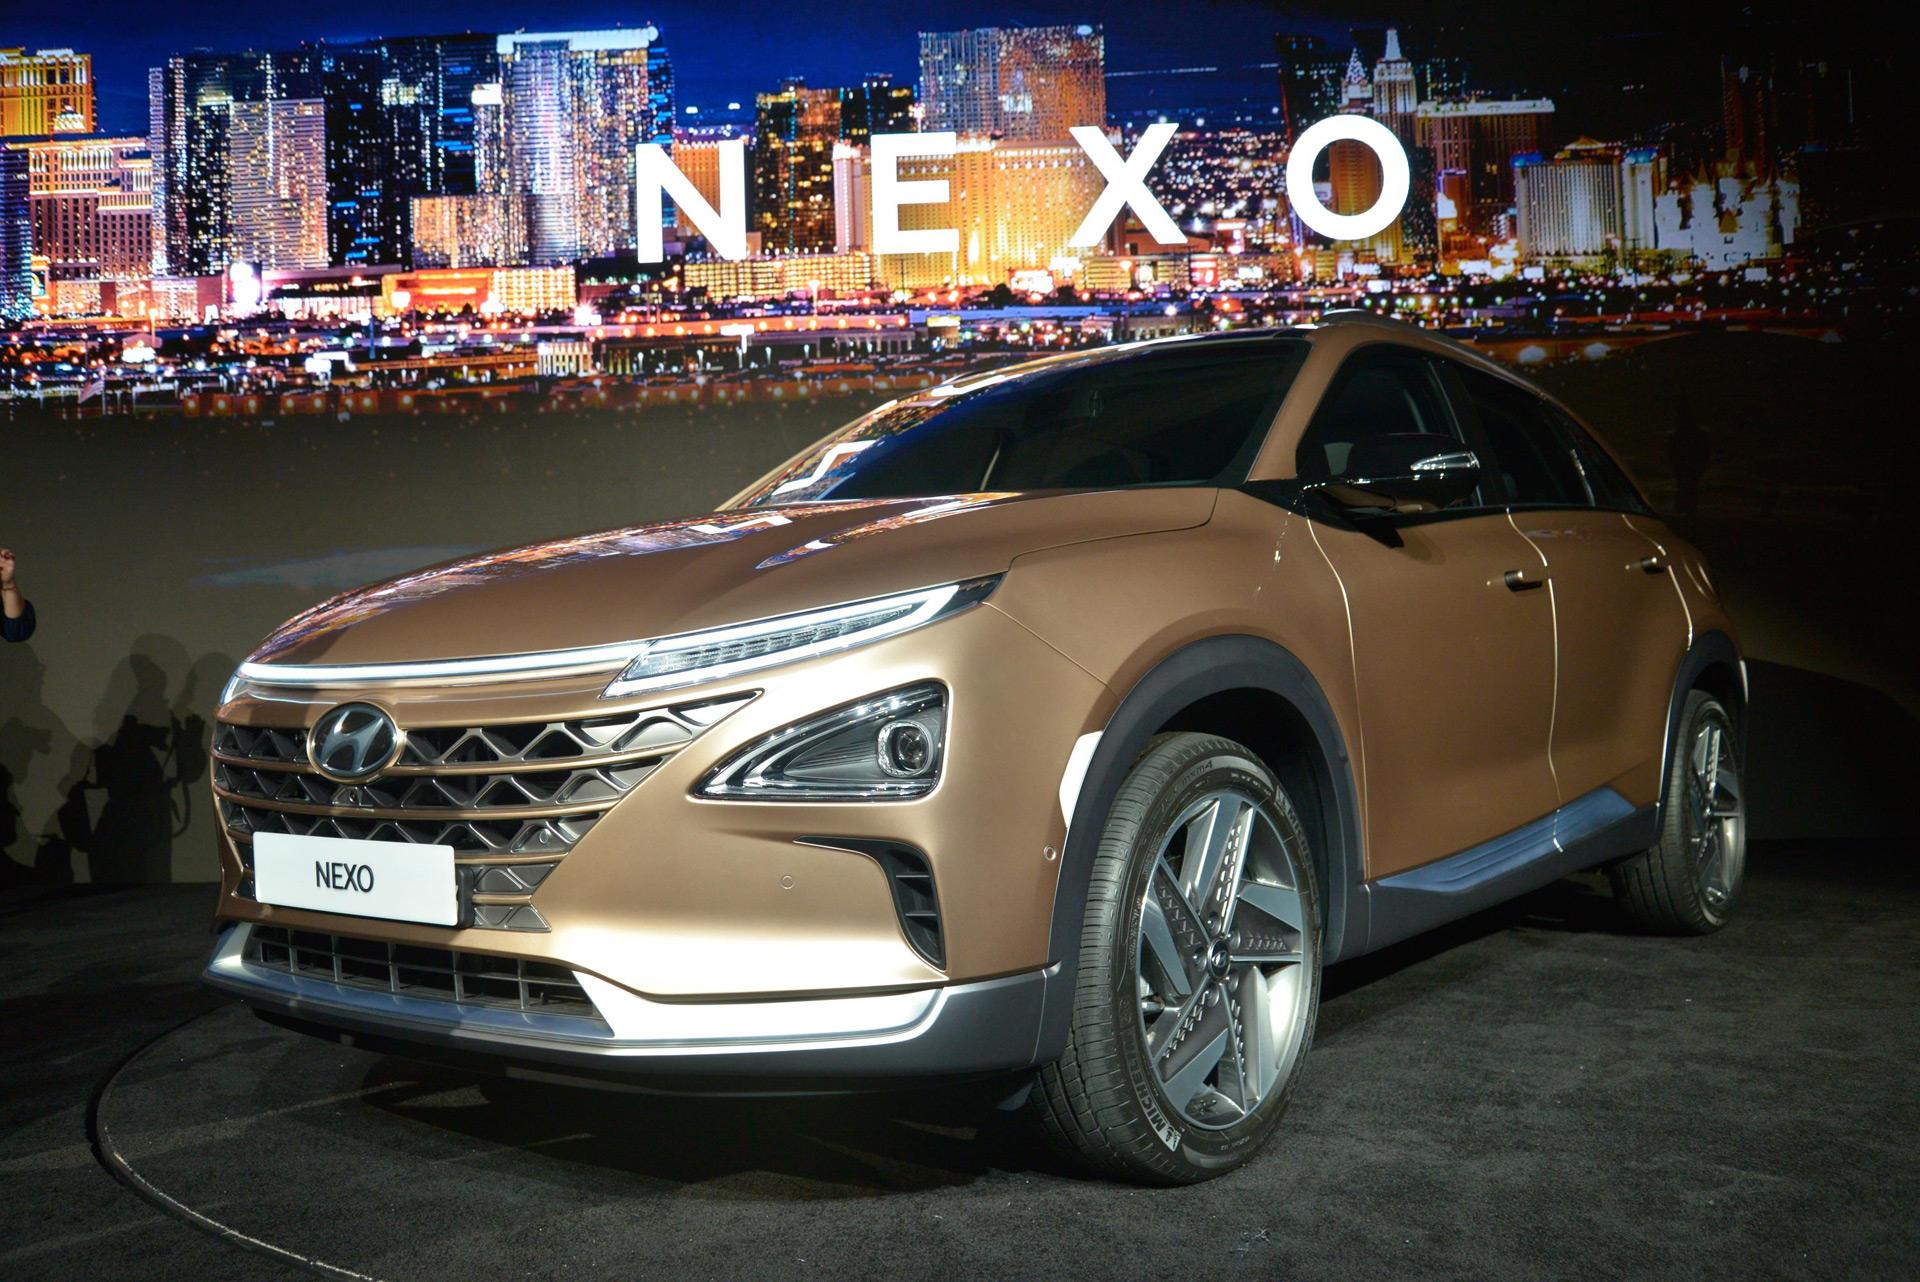 Hyundai Reveals Nexo Fuel Cell Powered SUV At 2018 CES